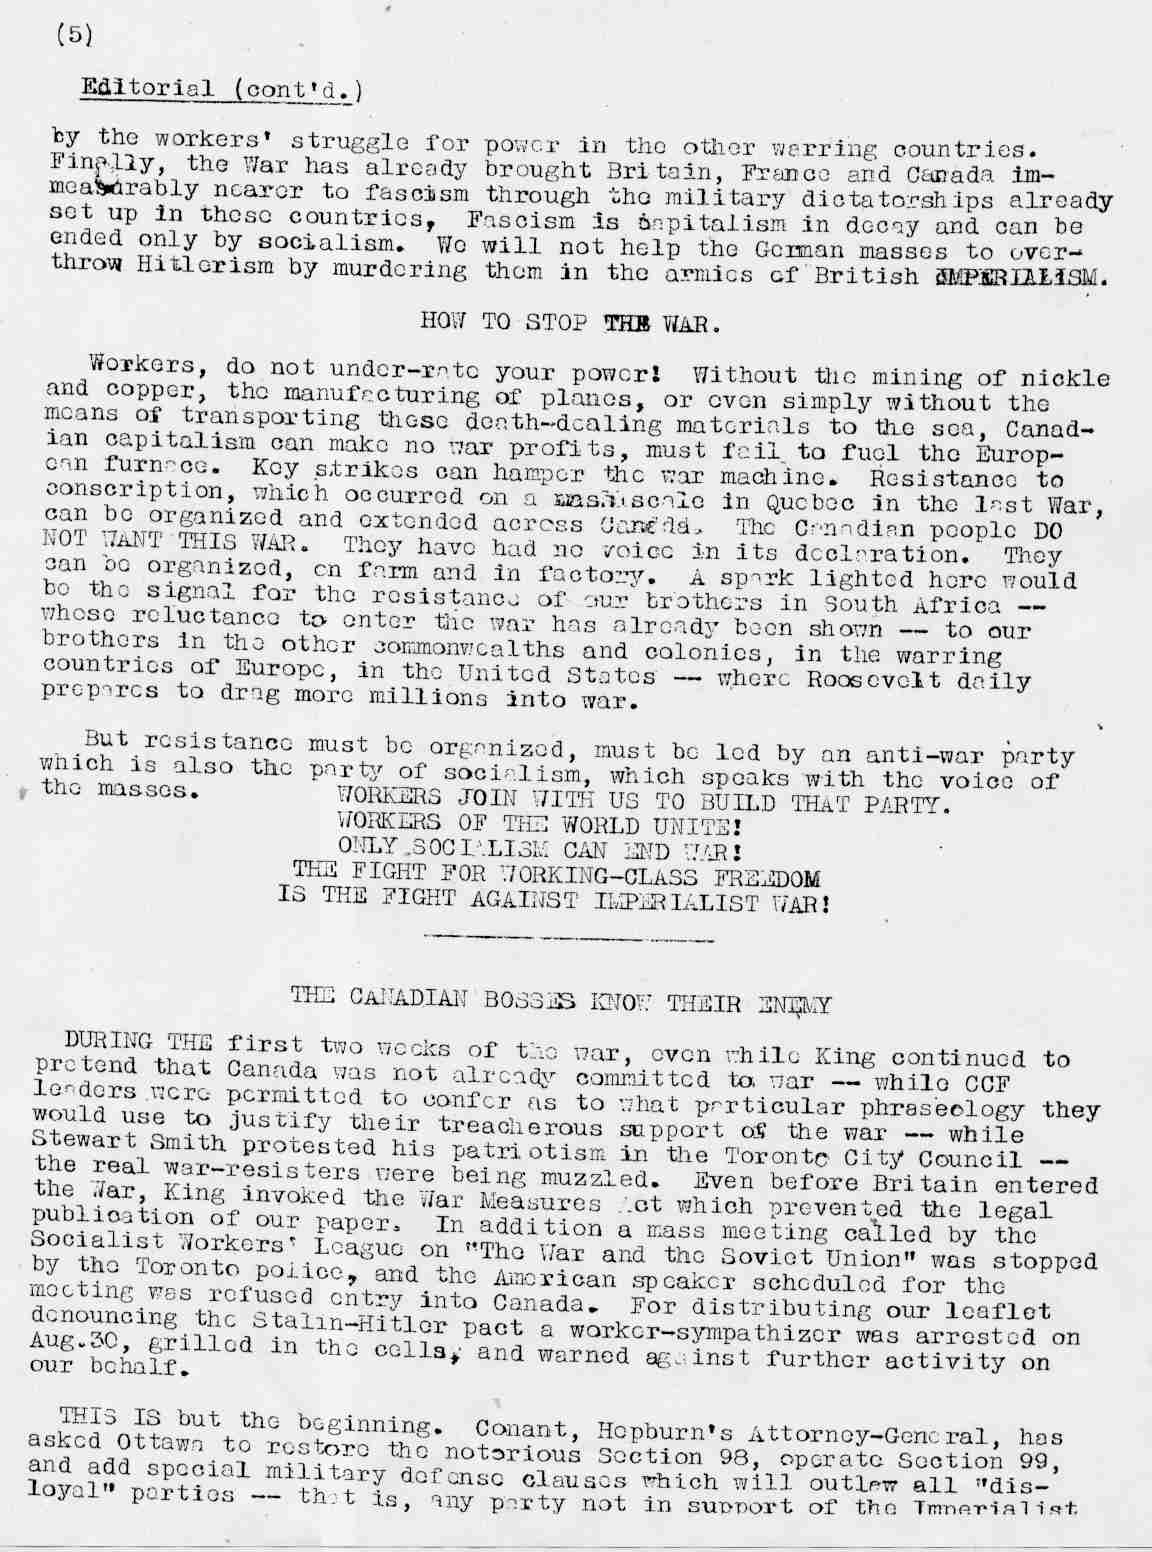 Ross Dowson Correspondence 1938 to 1942